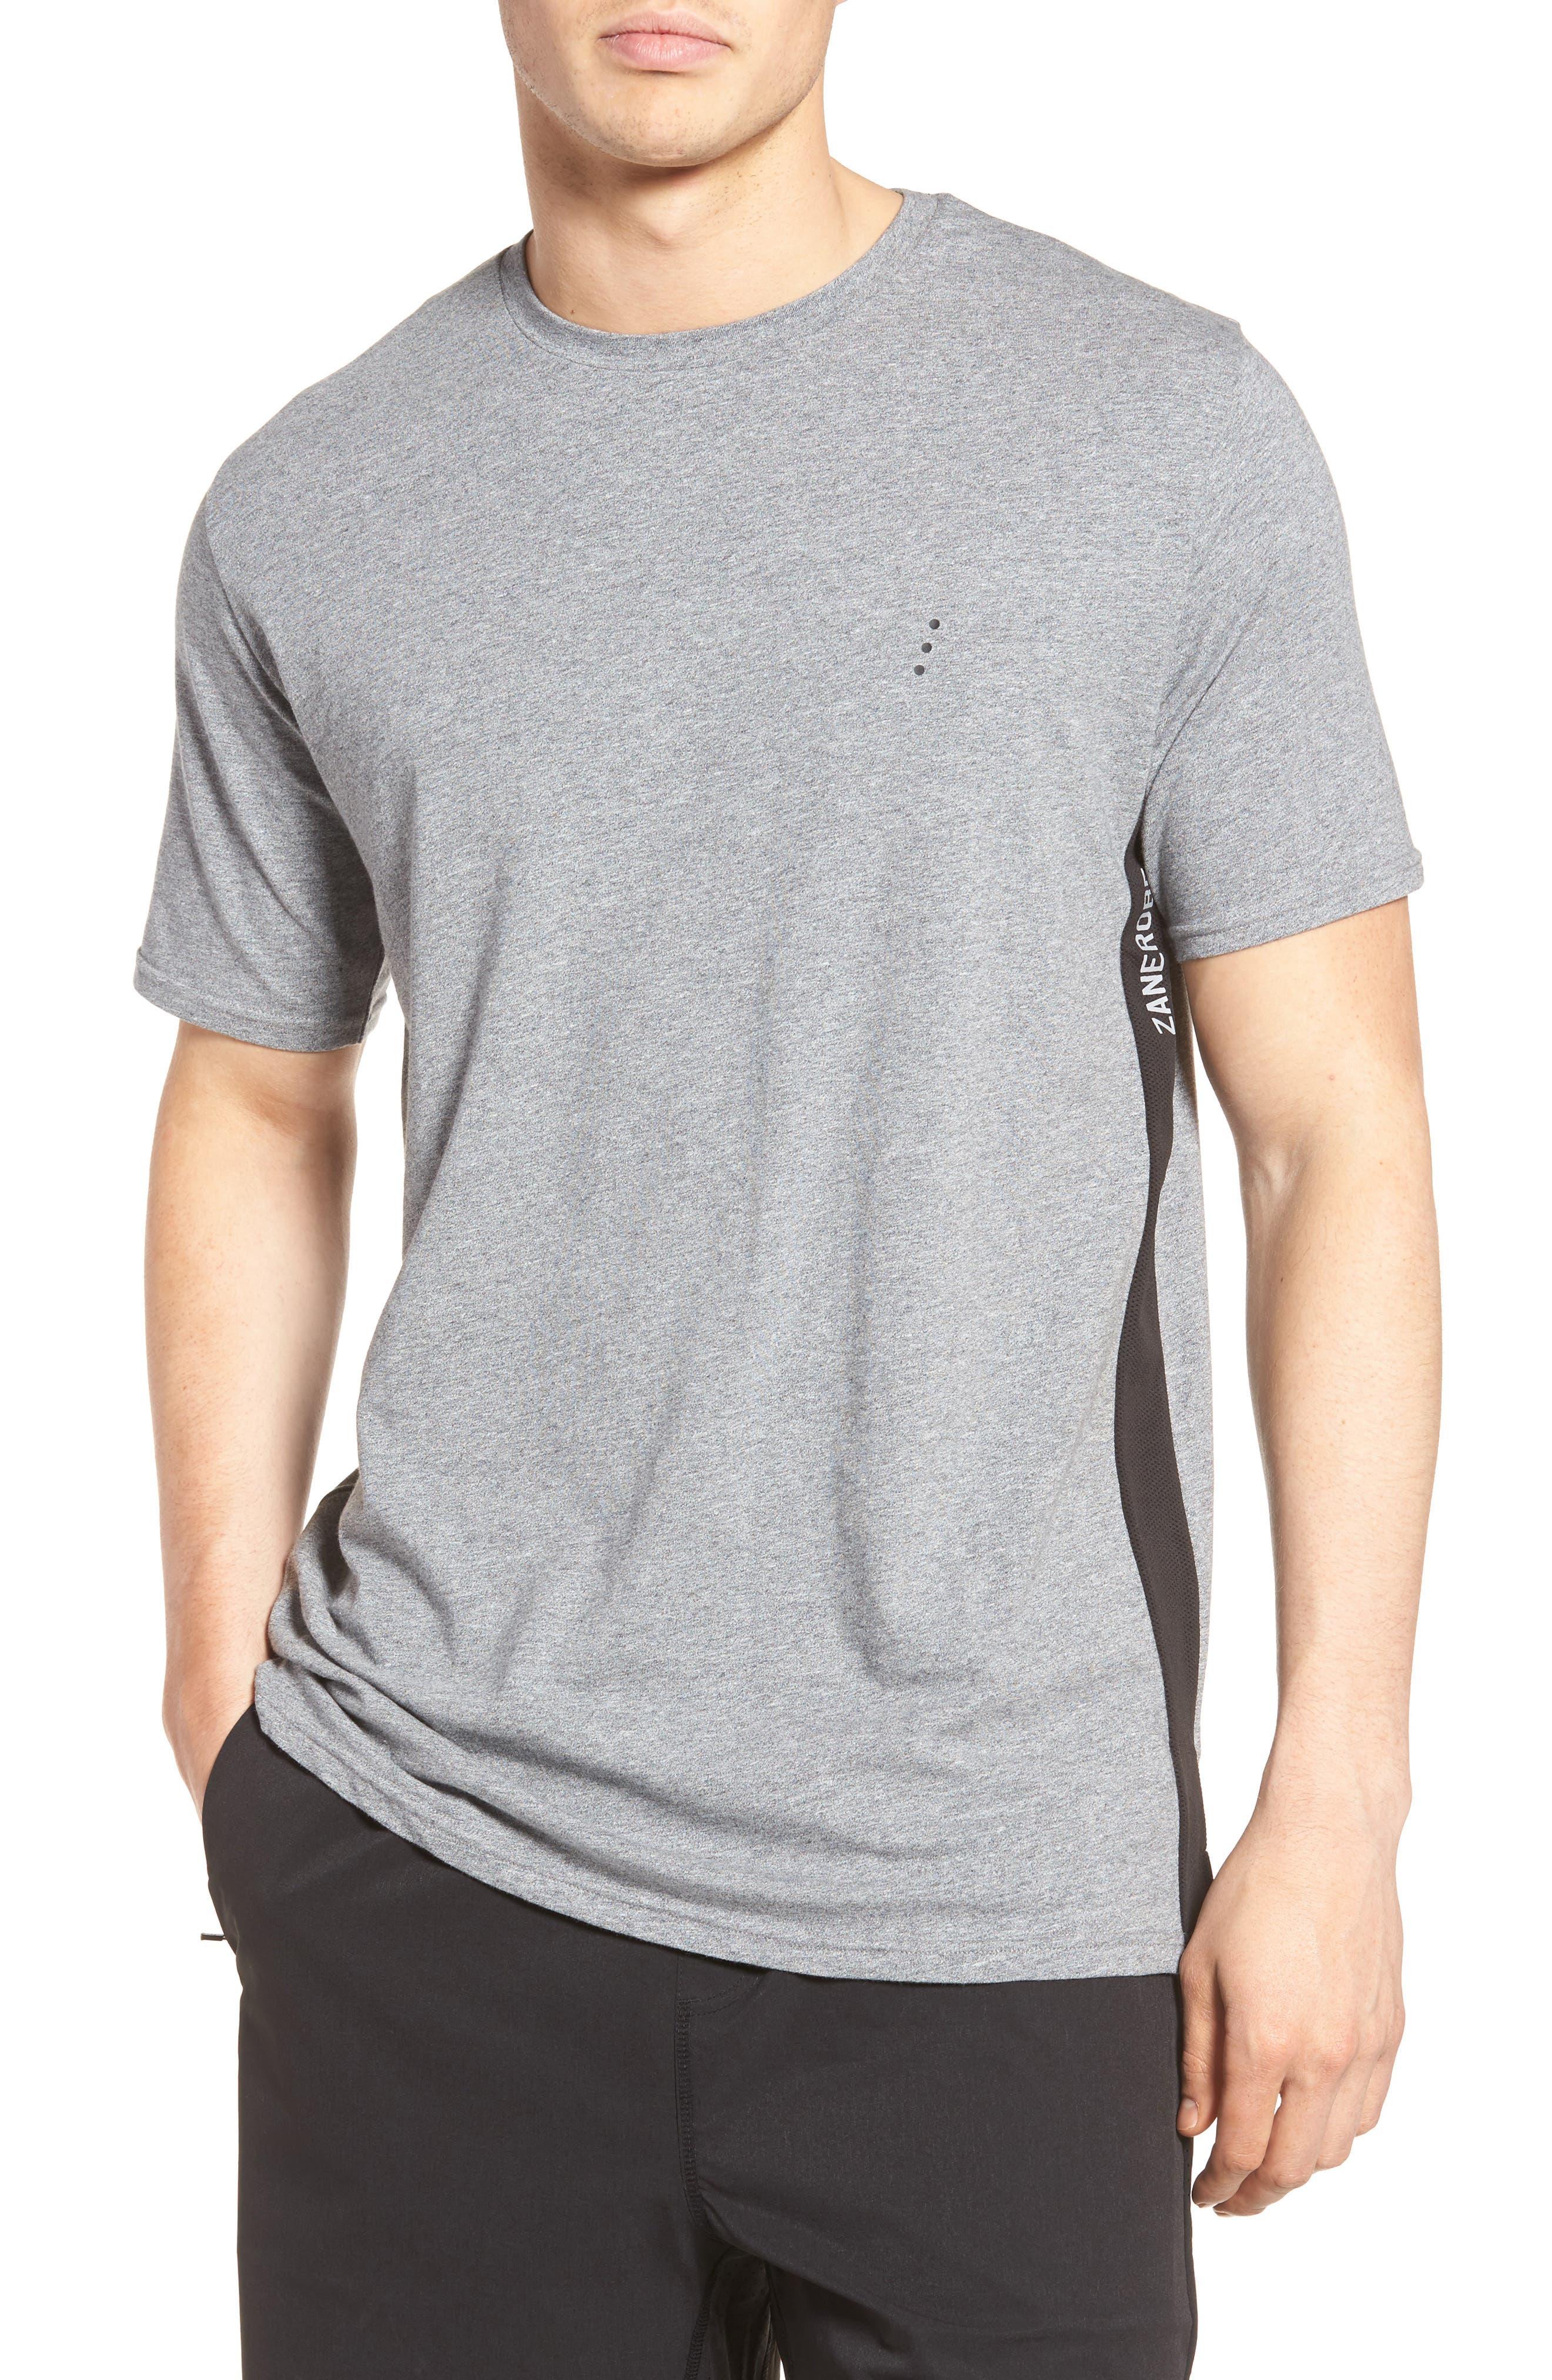 ZANEROBE REC Flintlock Mesh Side T-Shirt